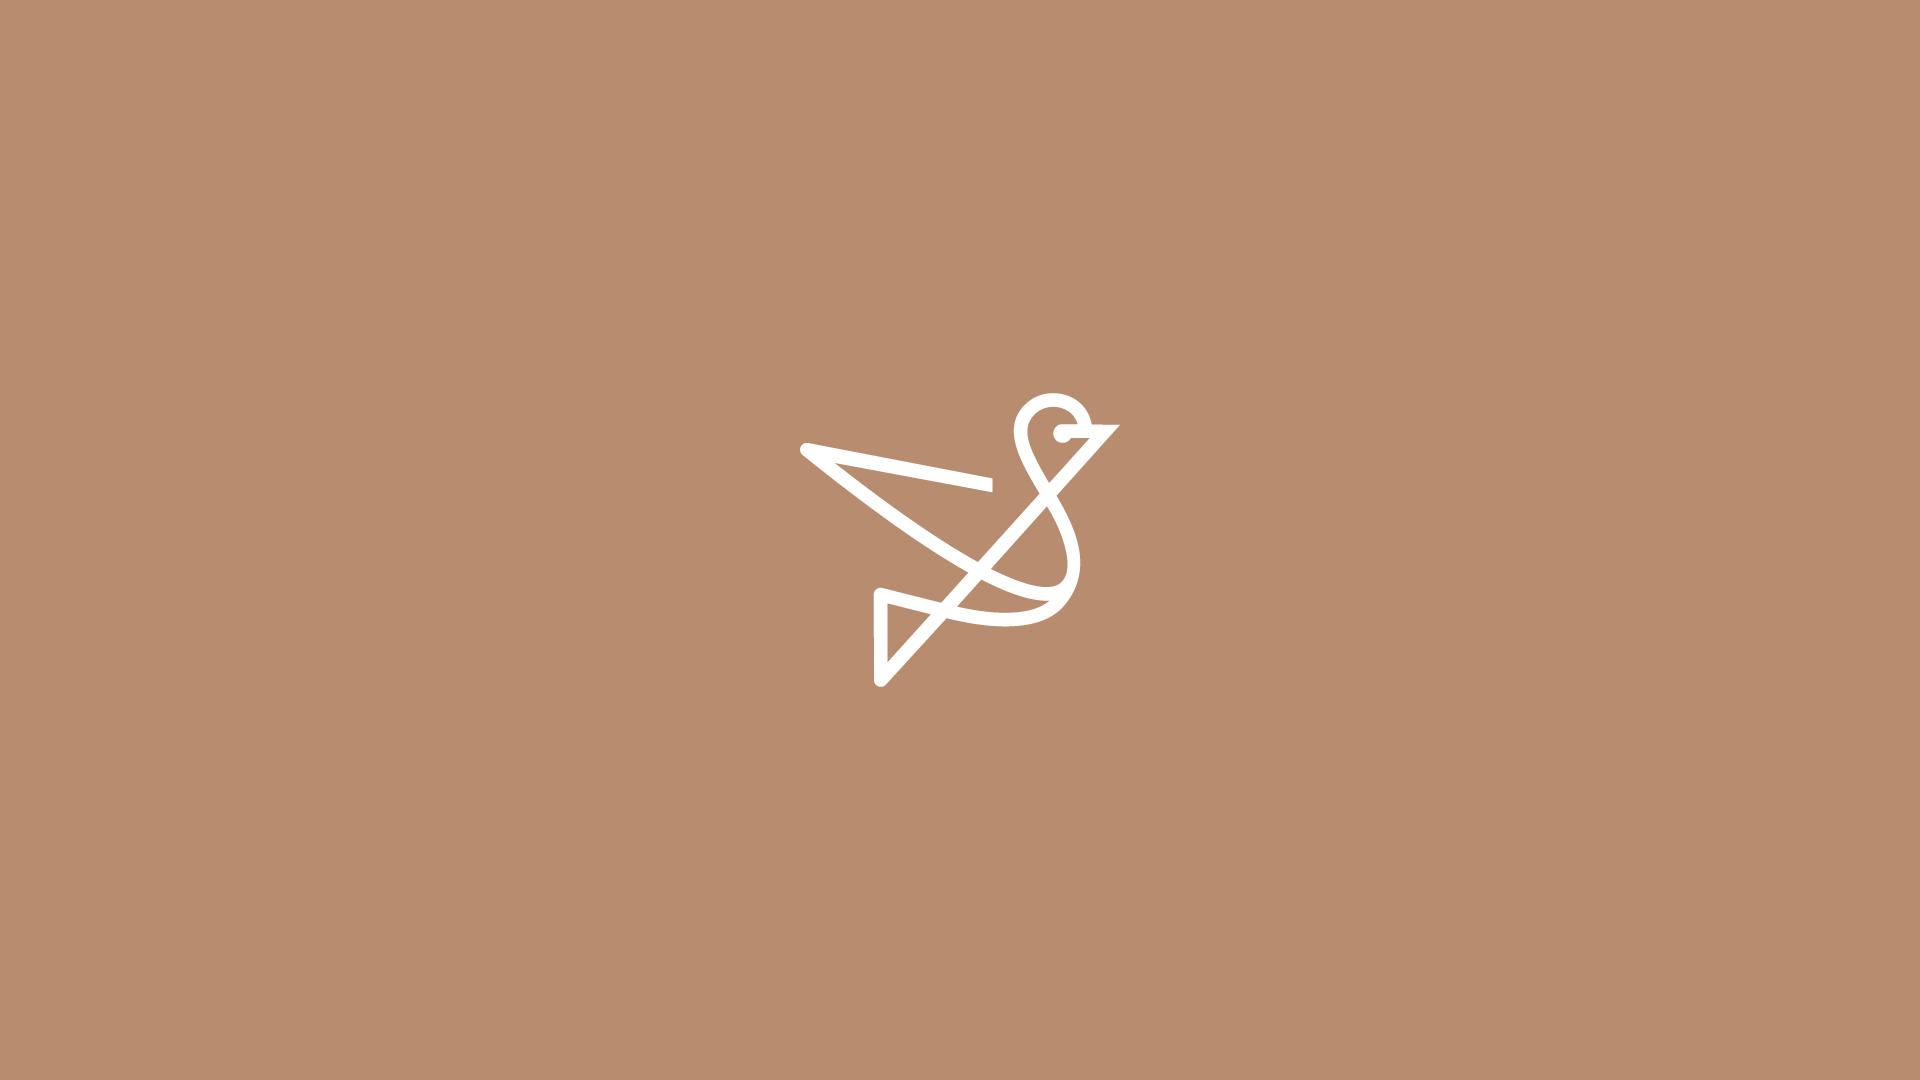 Beautiful bird logo design by DAINOGO